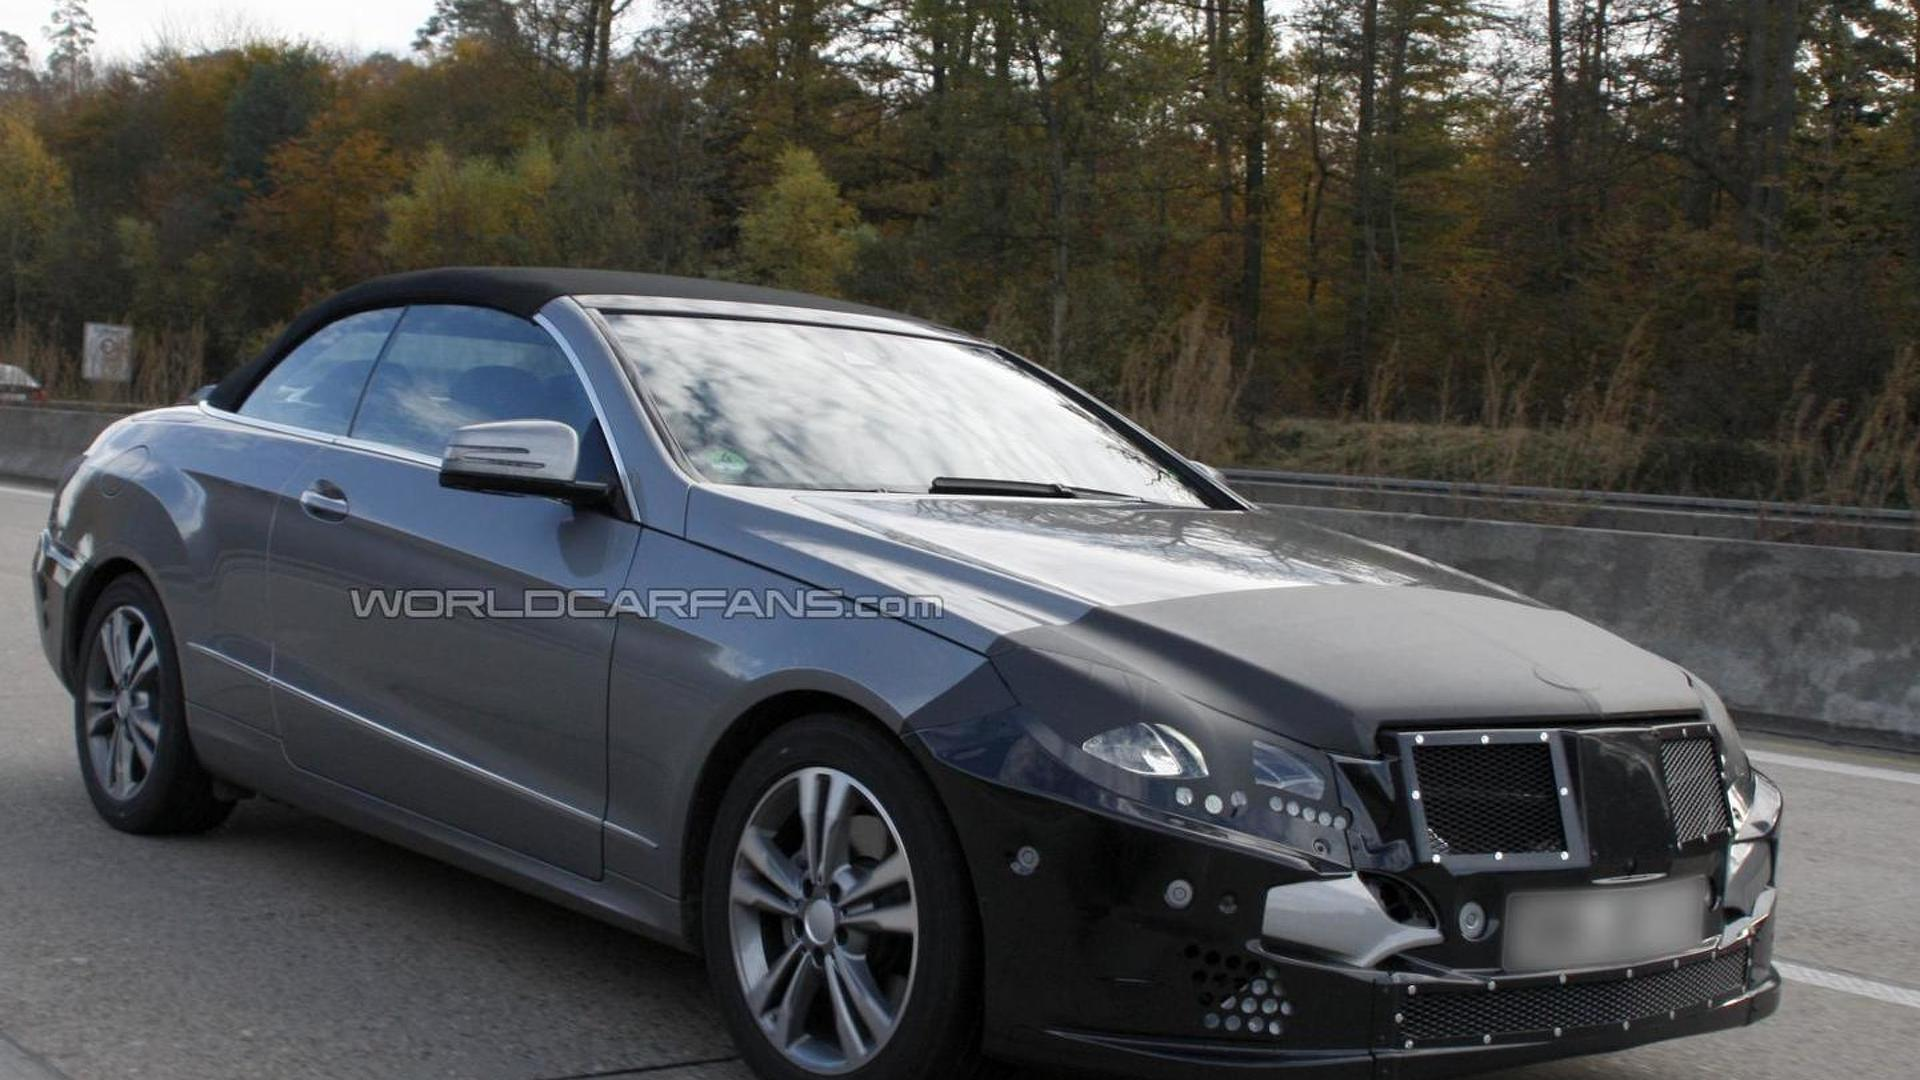 2014 Mercedes-Benz E-Class Cabrio facelift spied